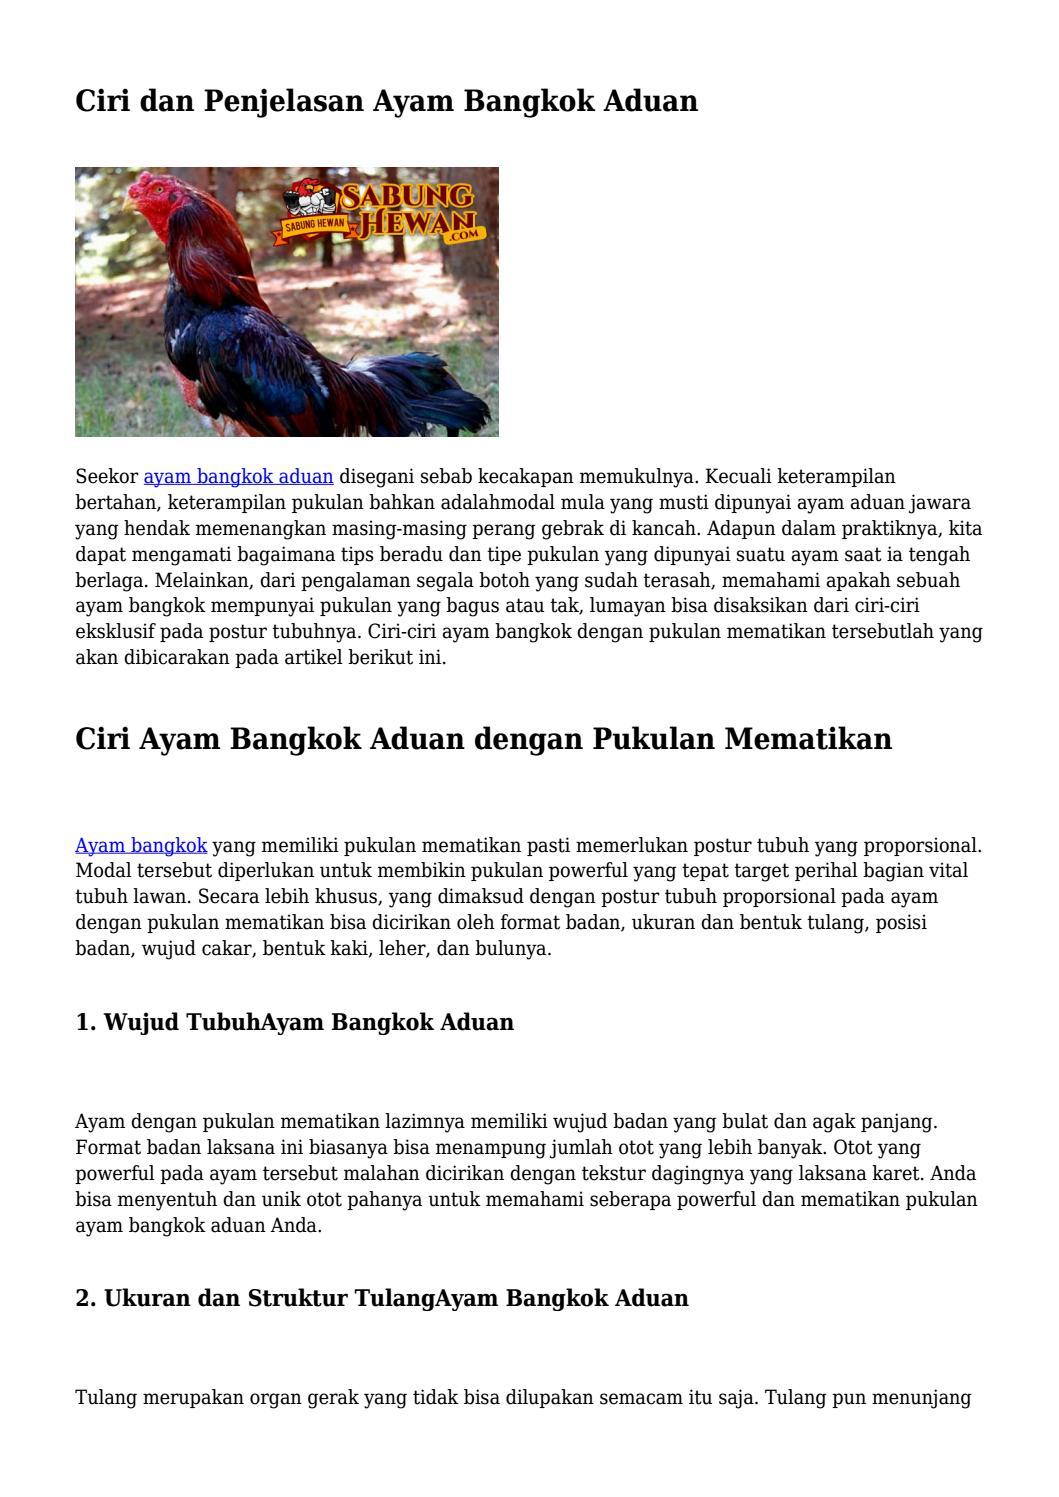 Cara Pukulan Mematikan : pukulan, mematikan, Penjelasan, Bangkok, Aduan..., Wickedartist3635, Issuu